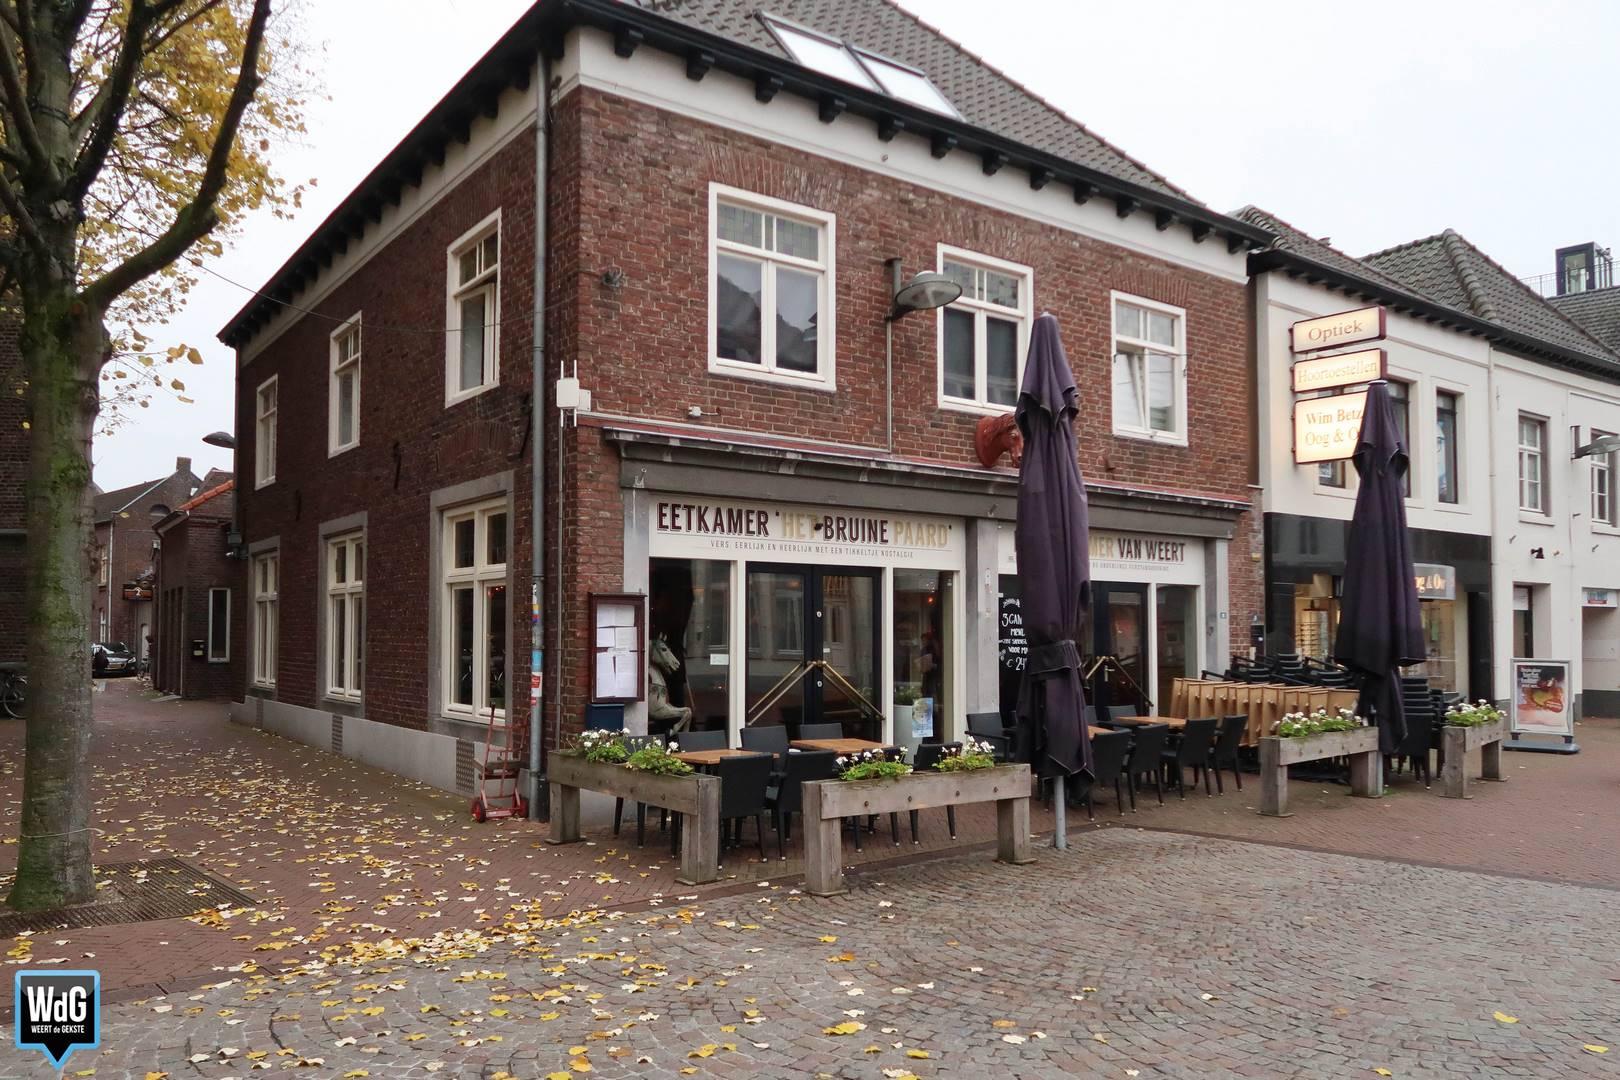 Emejing Eetkamer De Oude Schut Contemporary - House Design Ideas ...